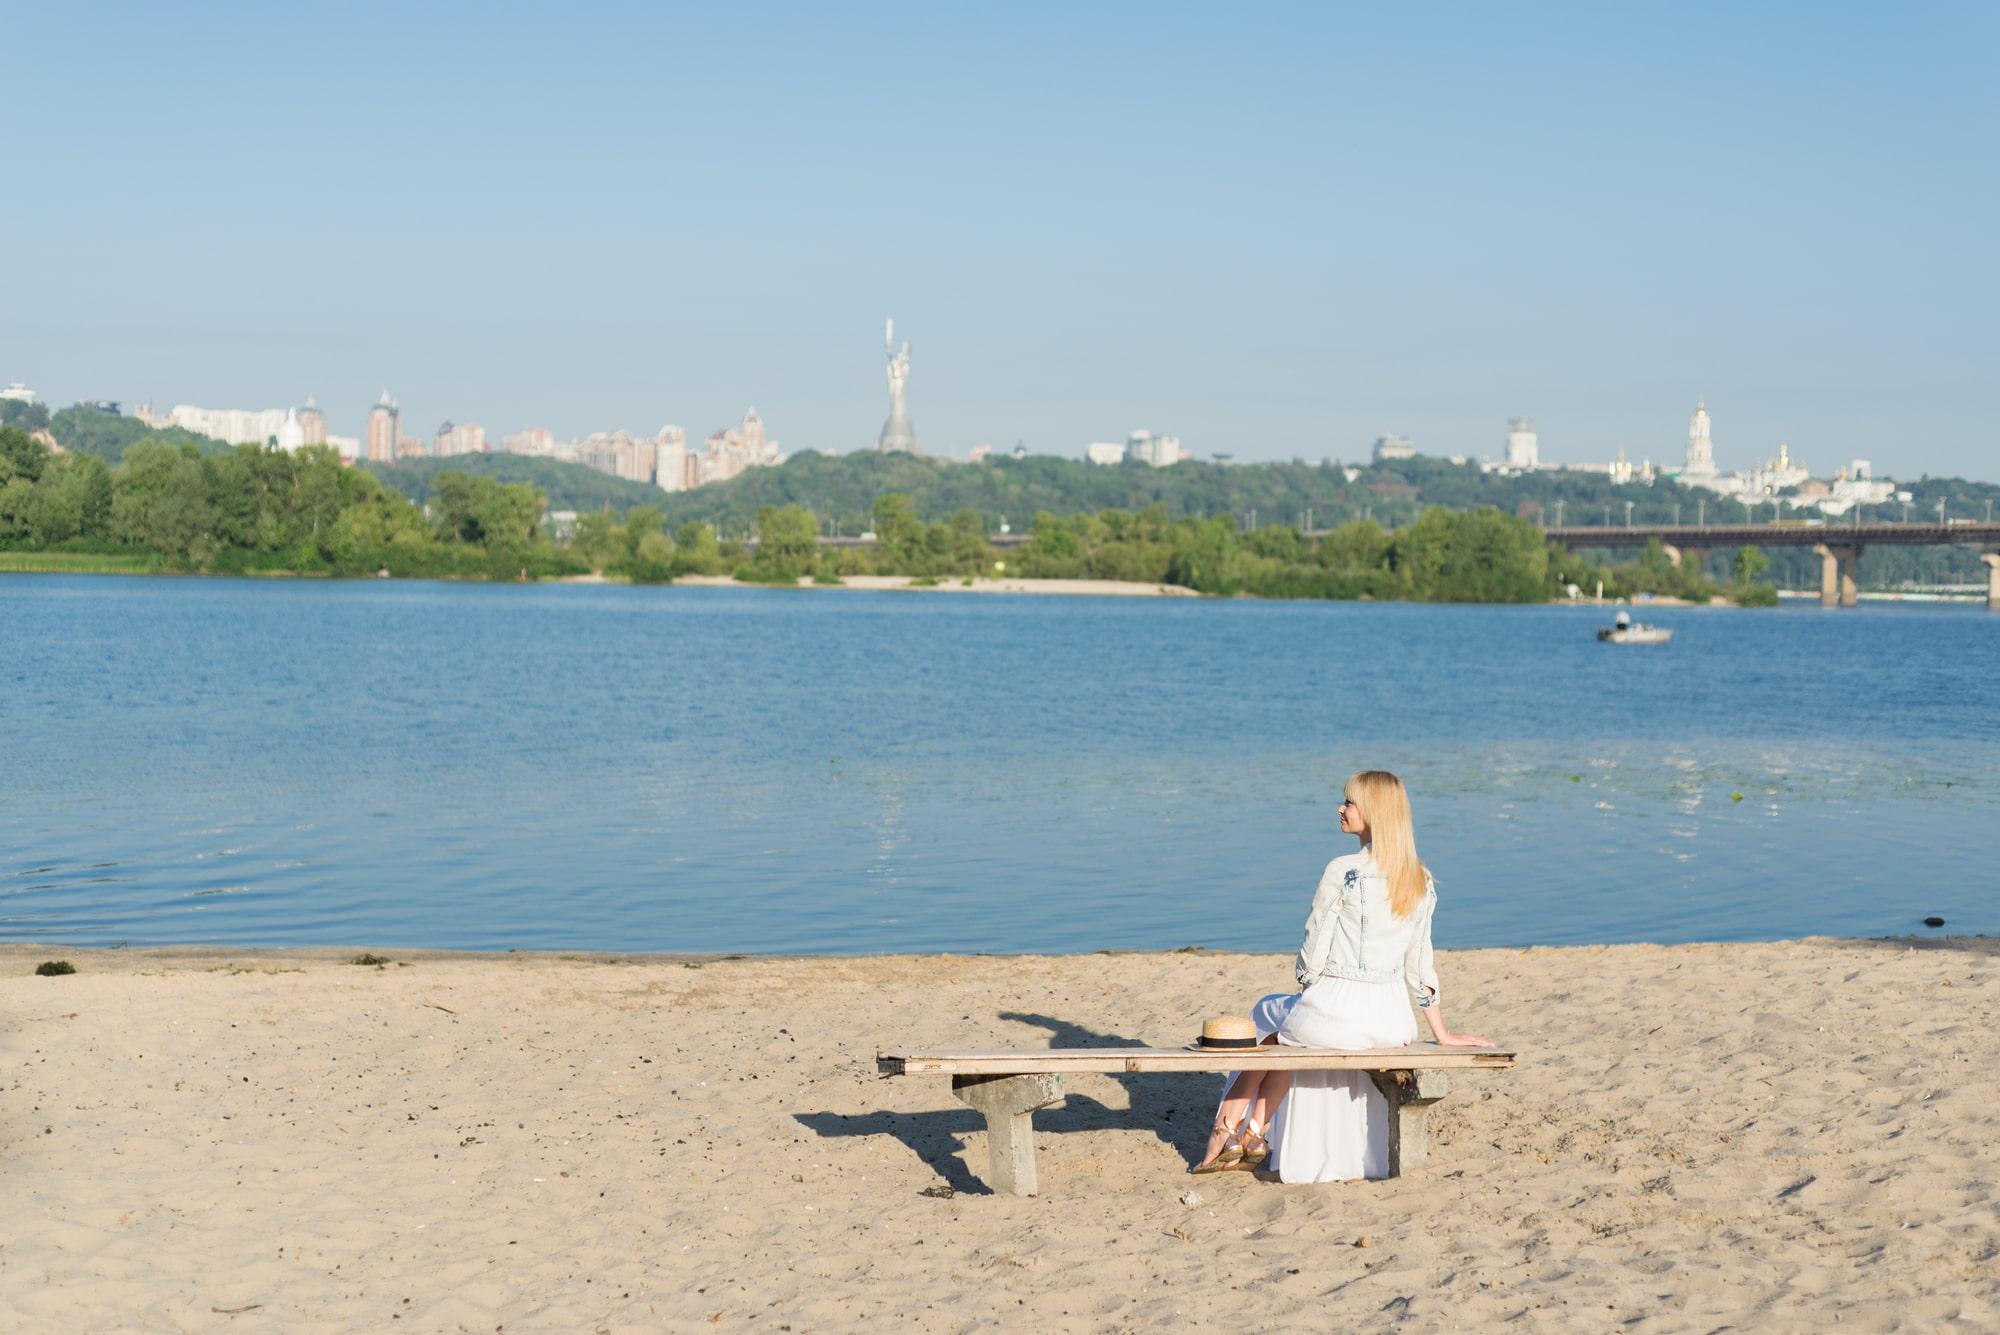 Фотосессия девушки возле реки Днепр - на скамейке